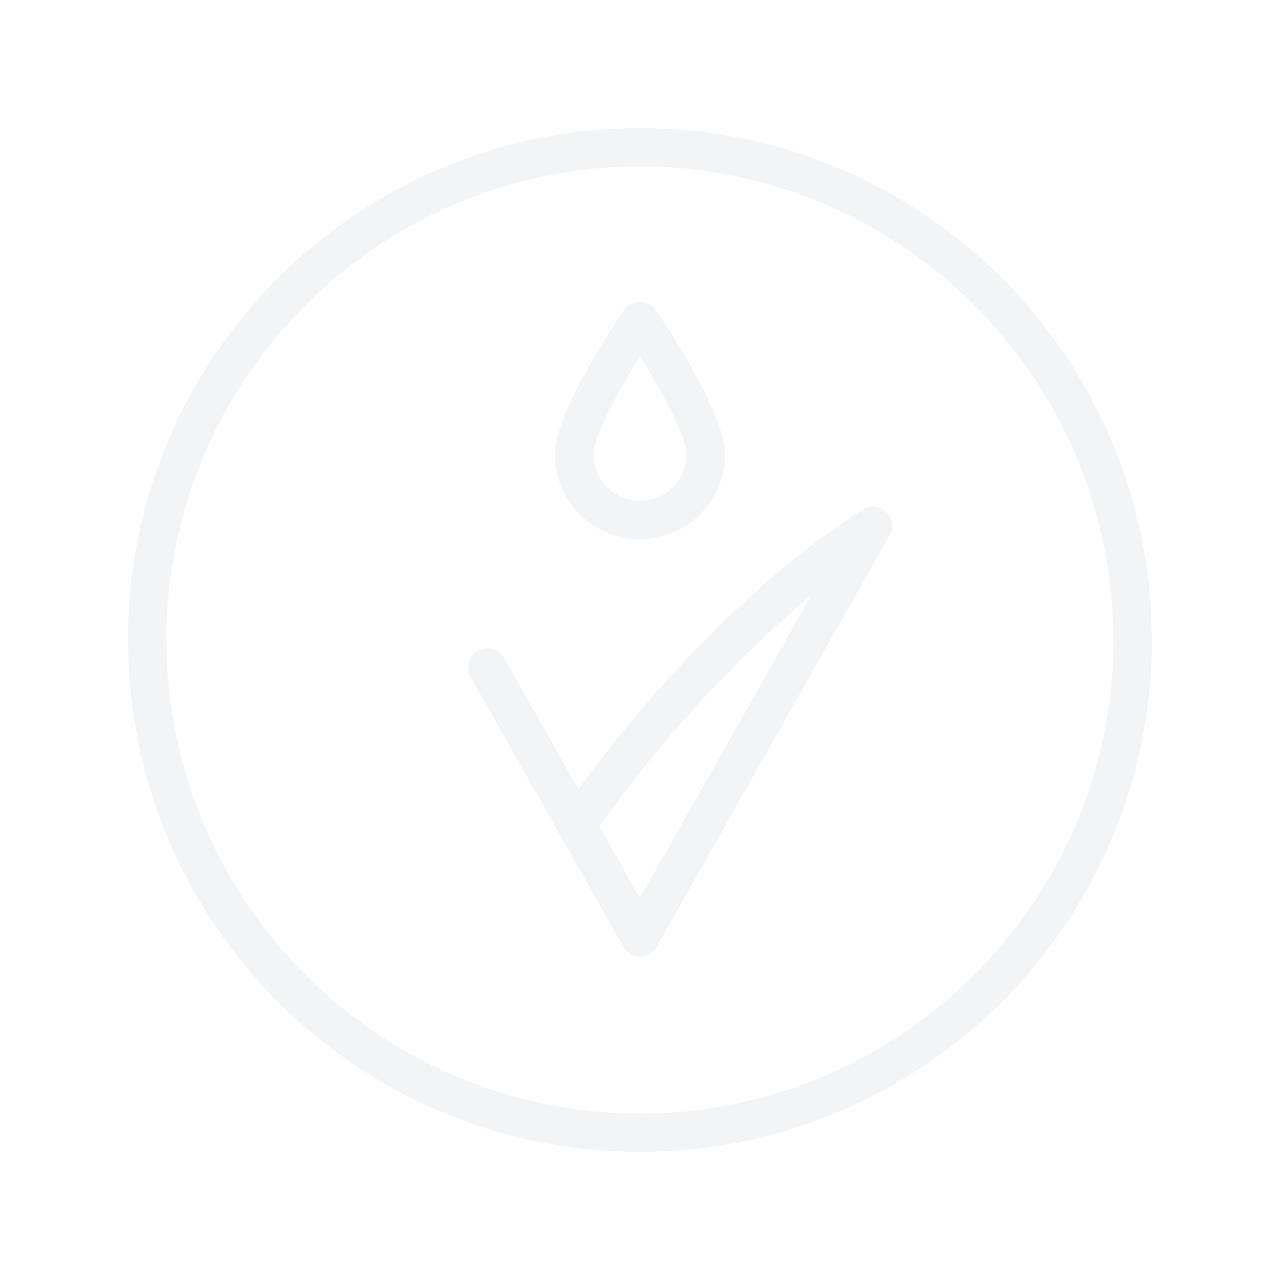 MAYBELLINE Color Tattoo 24hr Gel-Cream Eyeshadow No.97 Vintage Plum